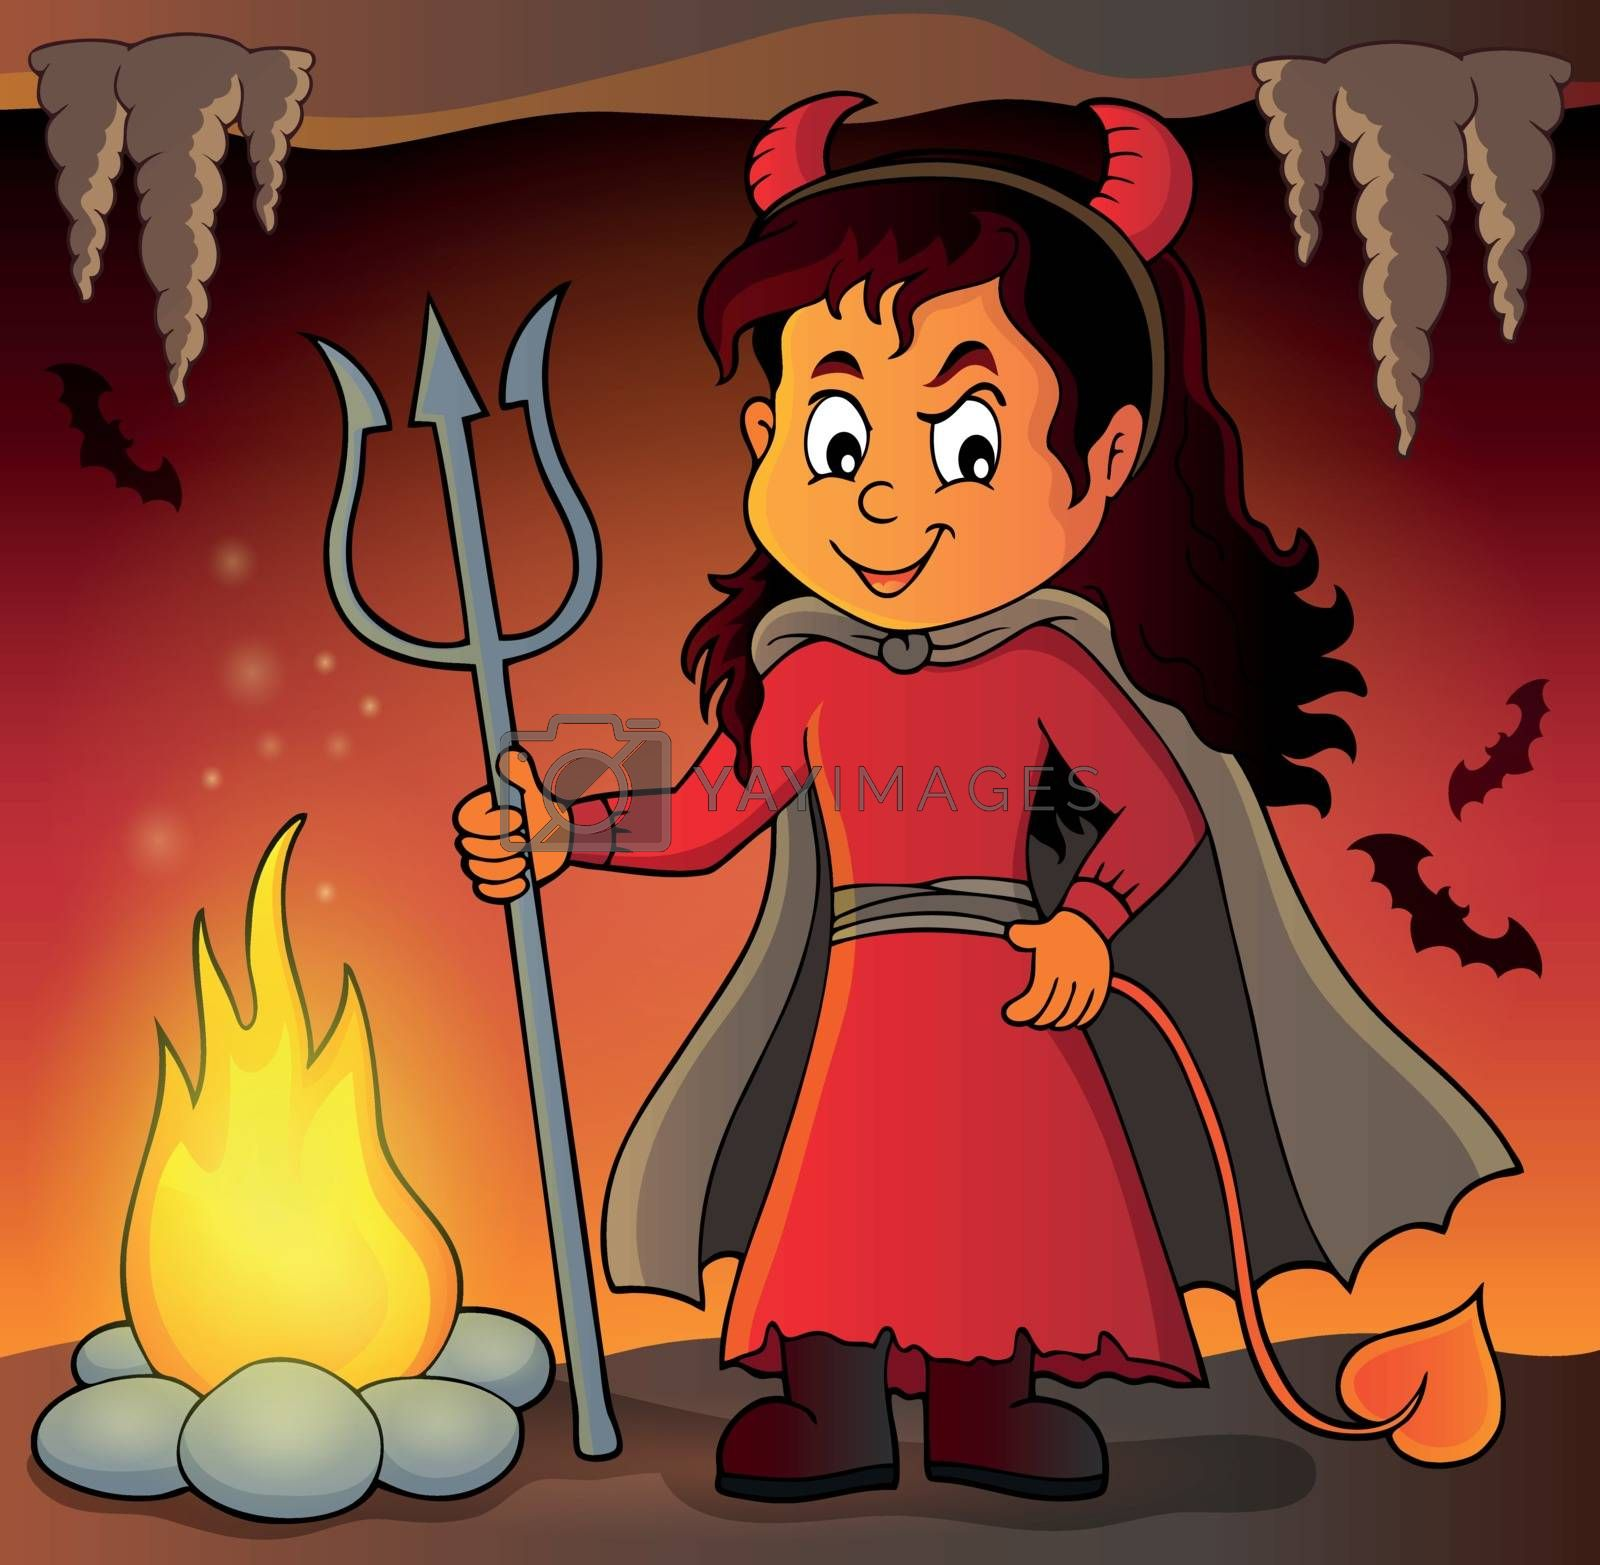 Girl in devil costume image 2 - eps10 vector illustration.